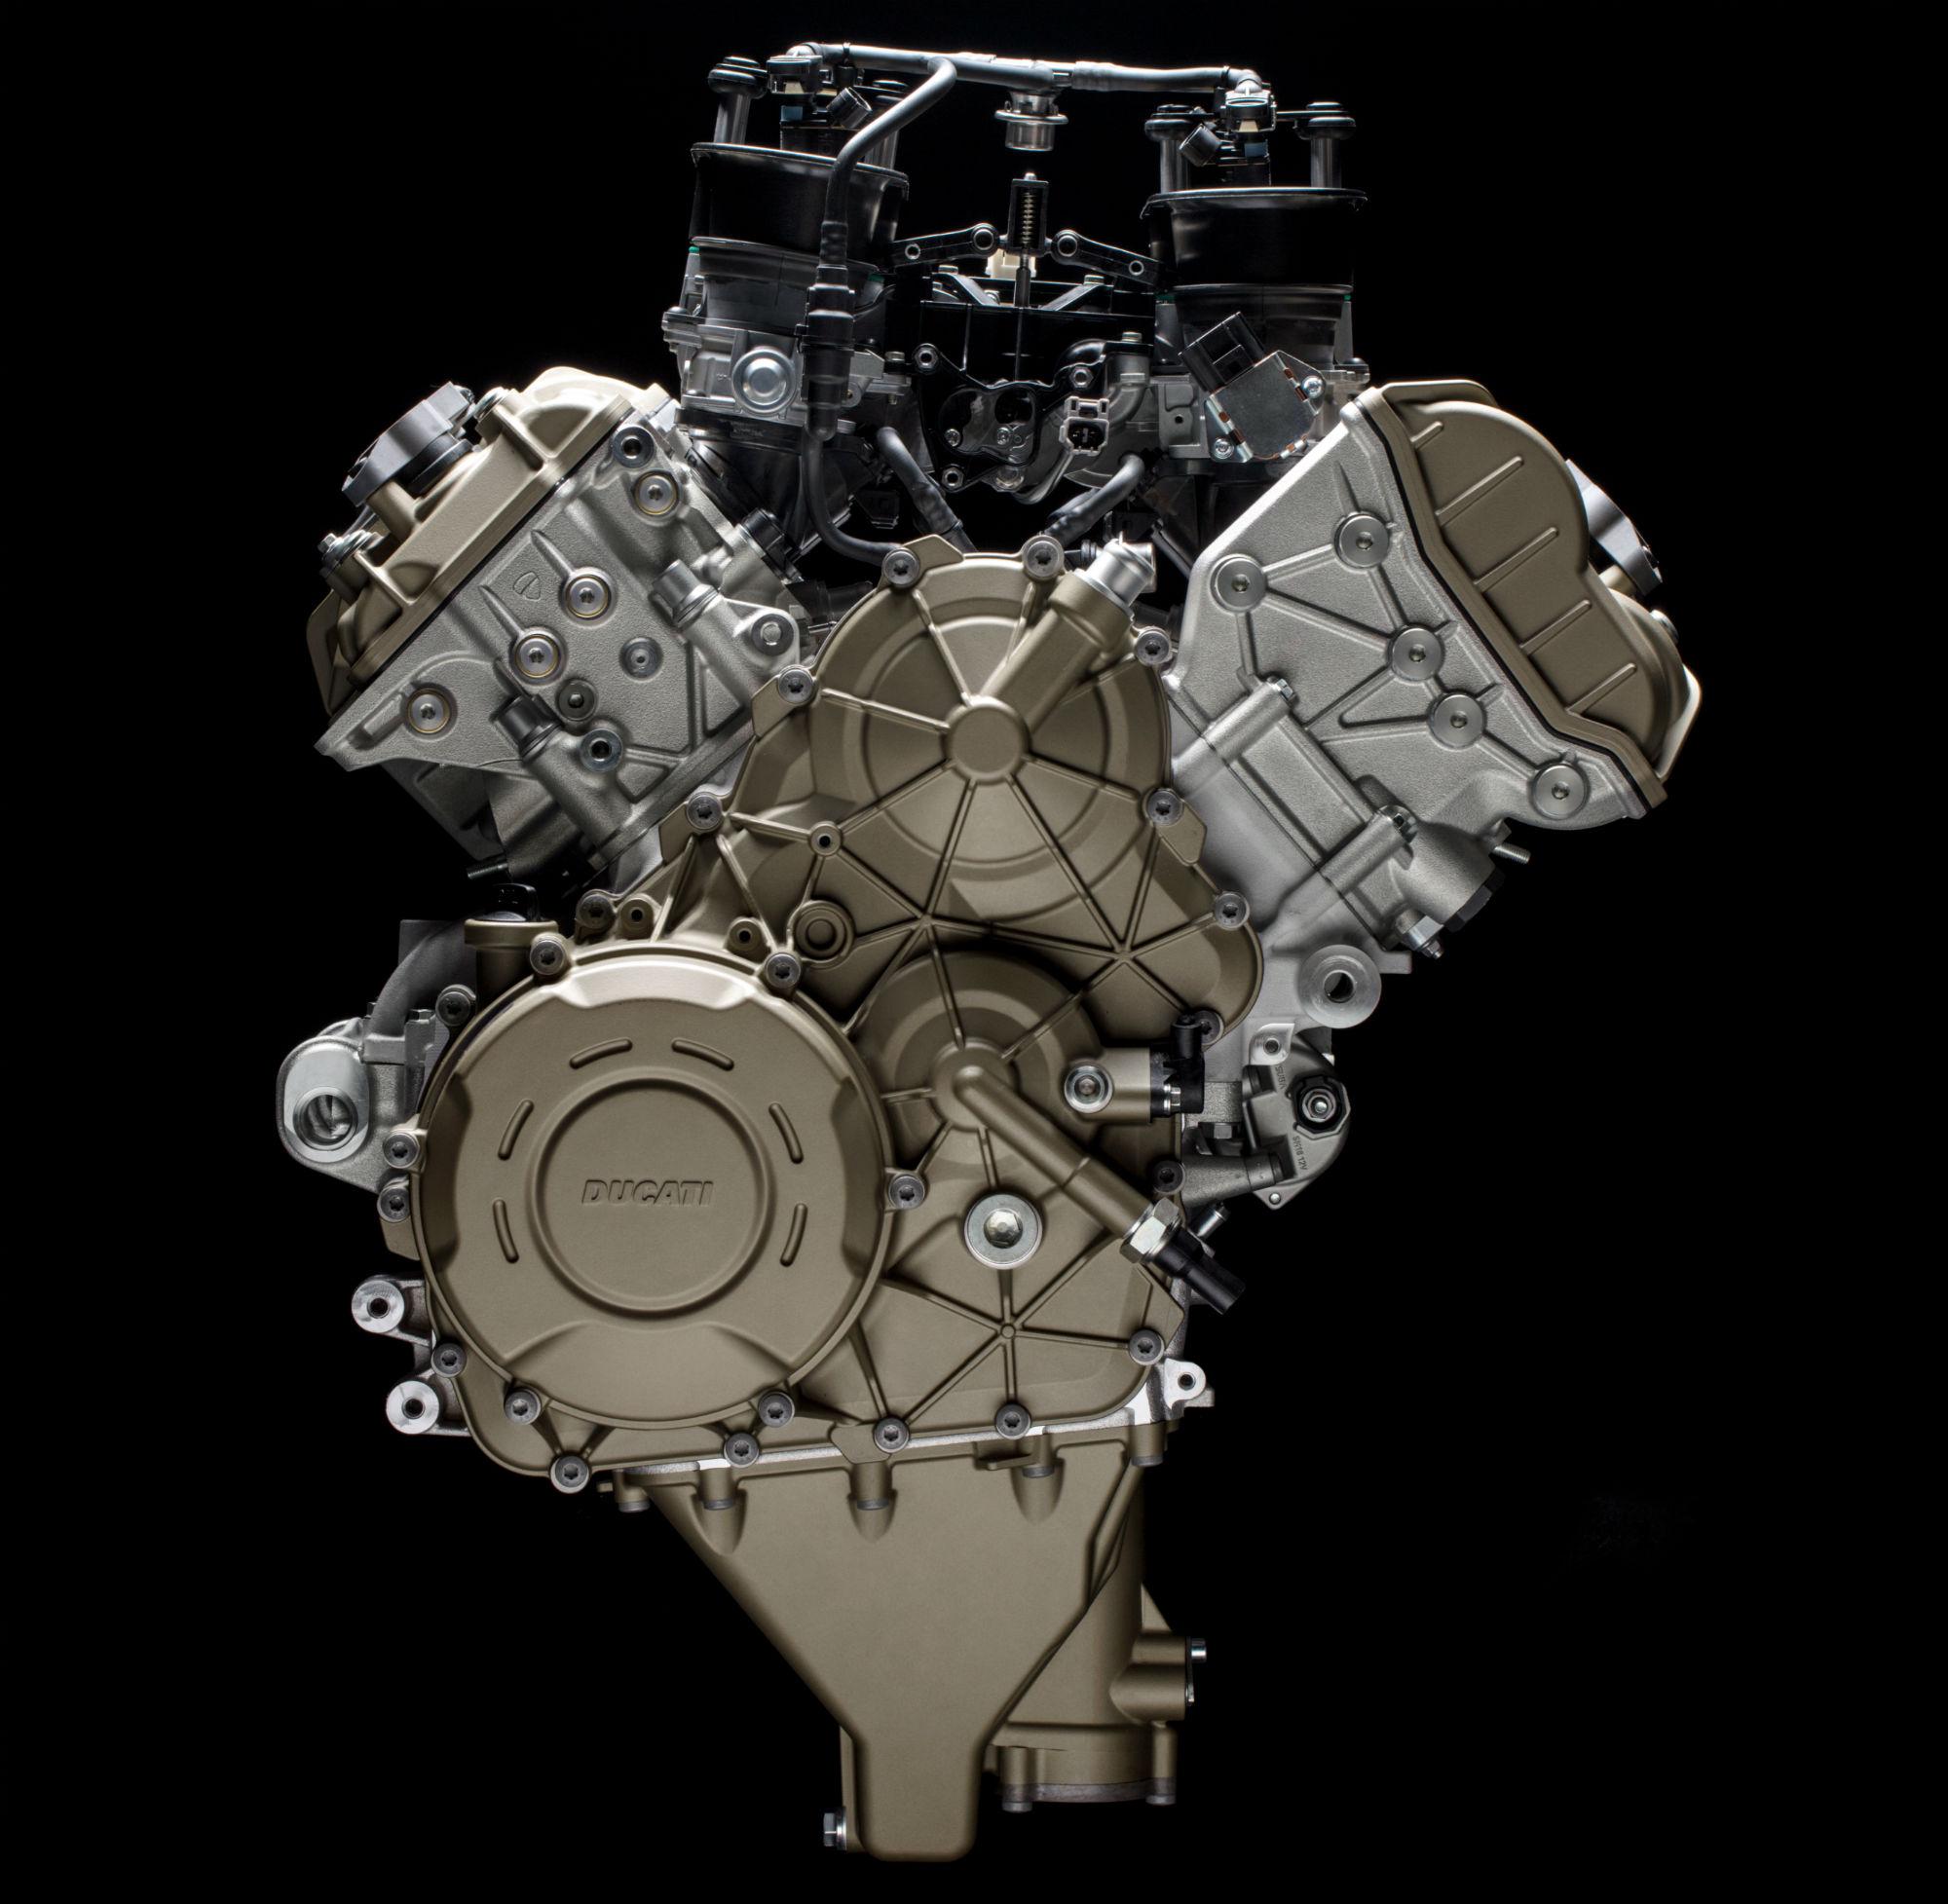 Ducati R Engine For Sale